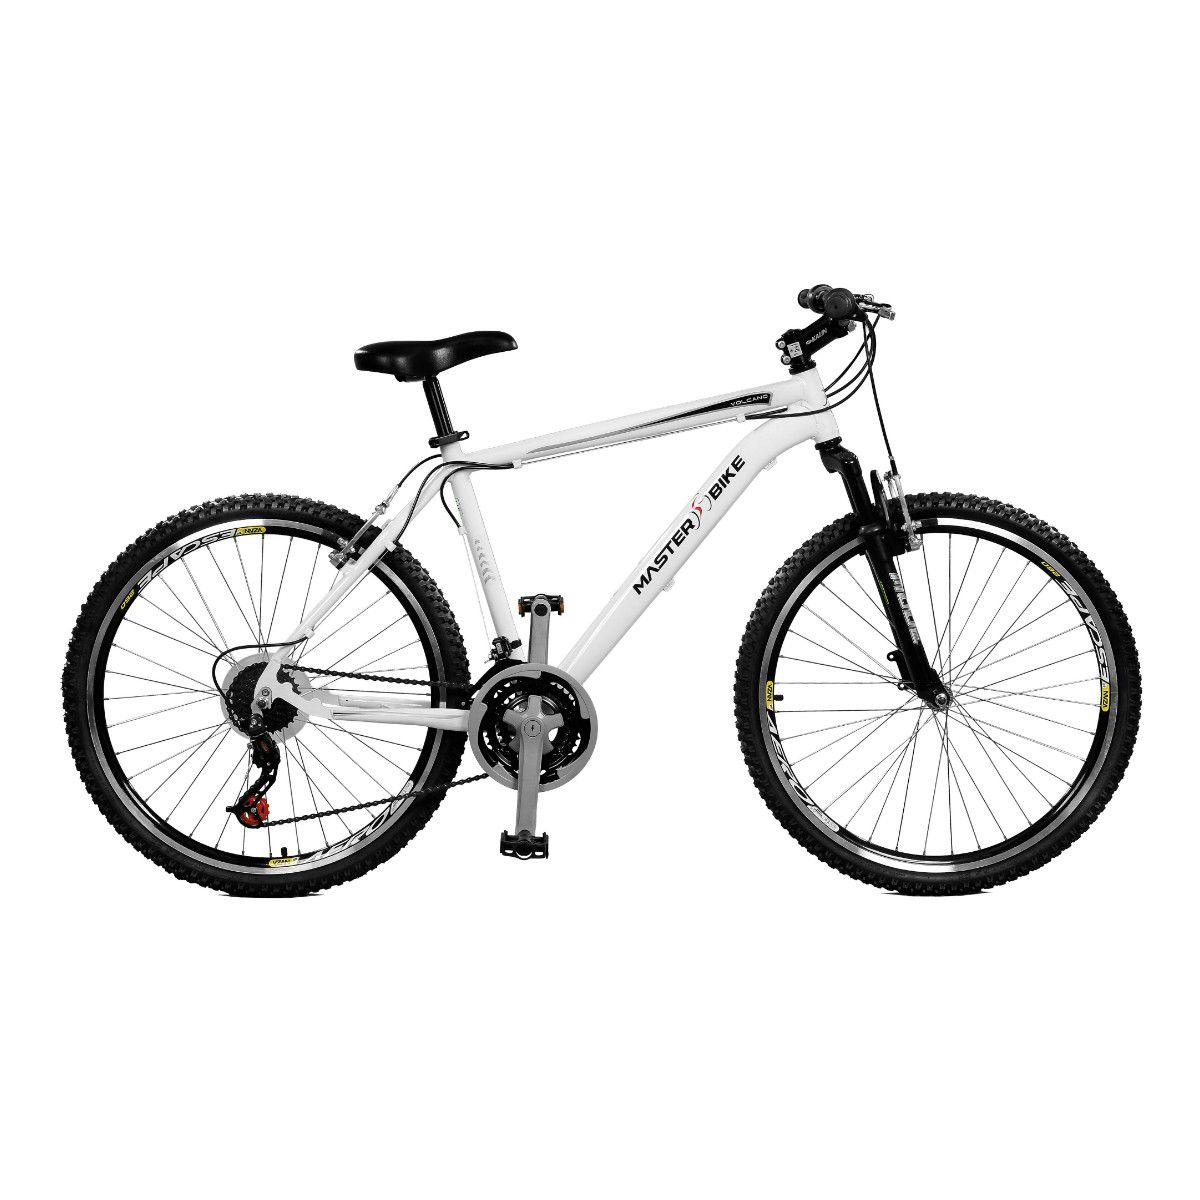 Bicicleta Master Bike Aro 26 Volcano S A-36 21 Marchas Branco